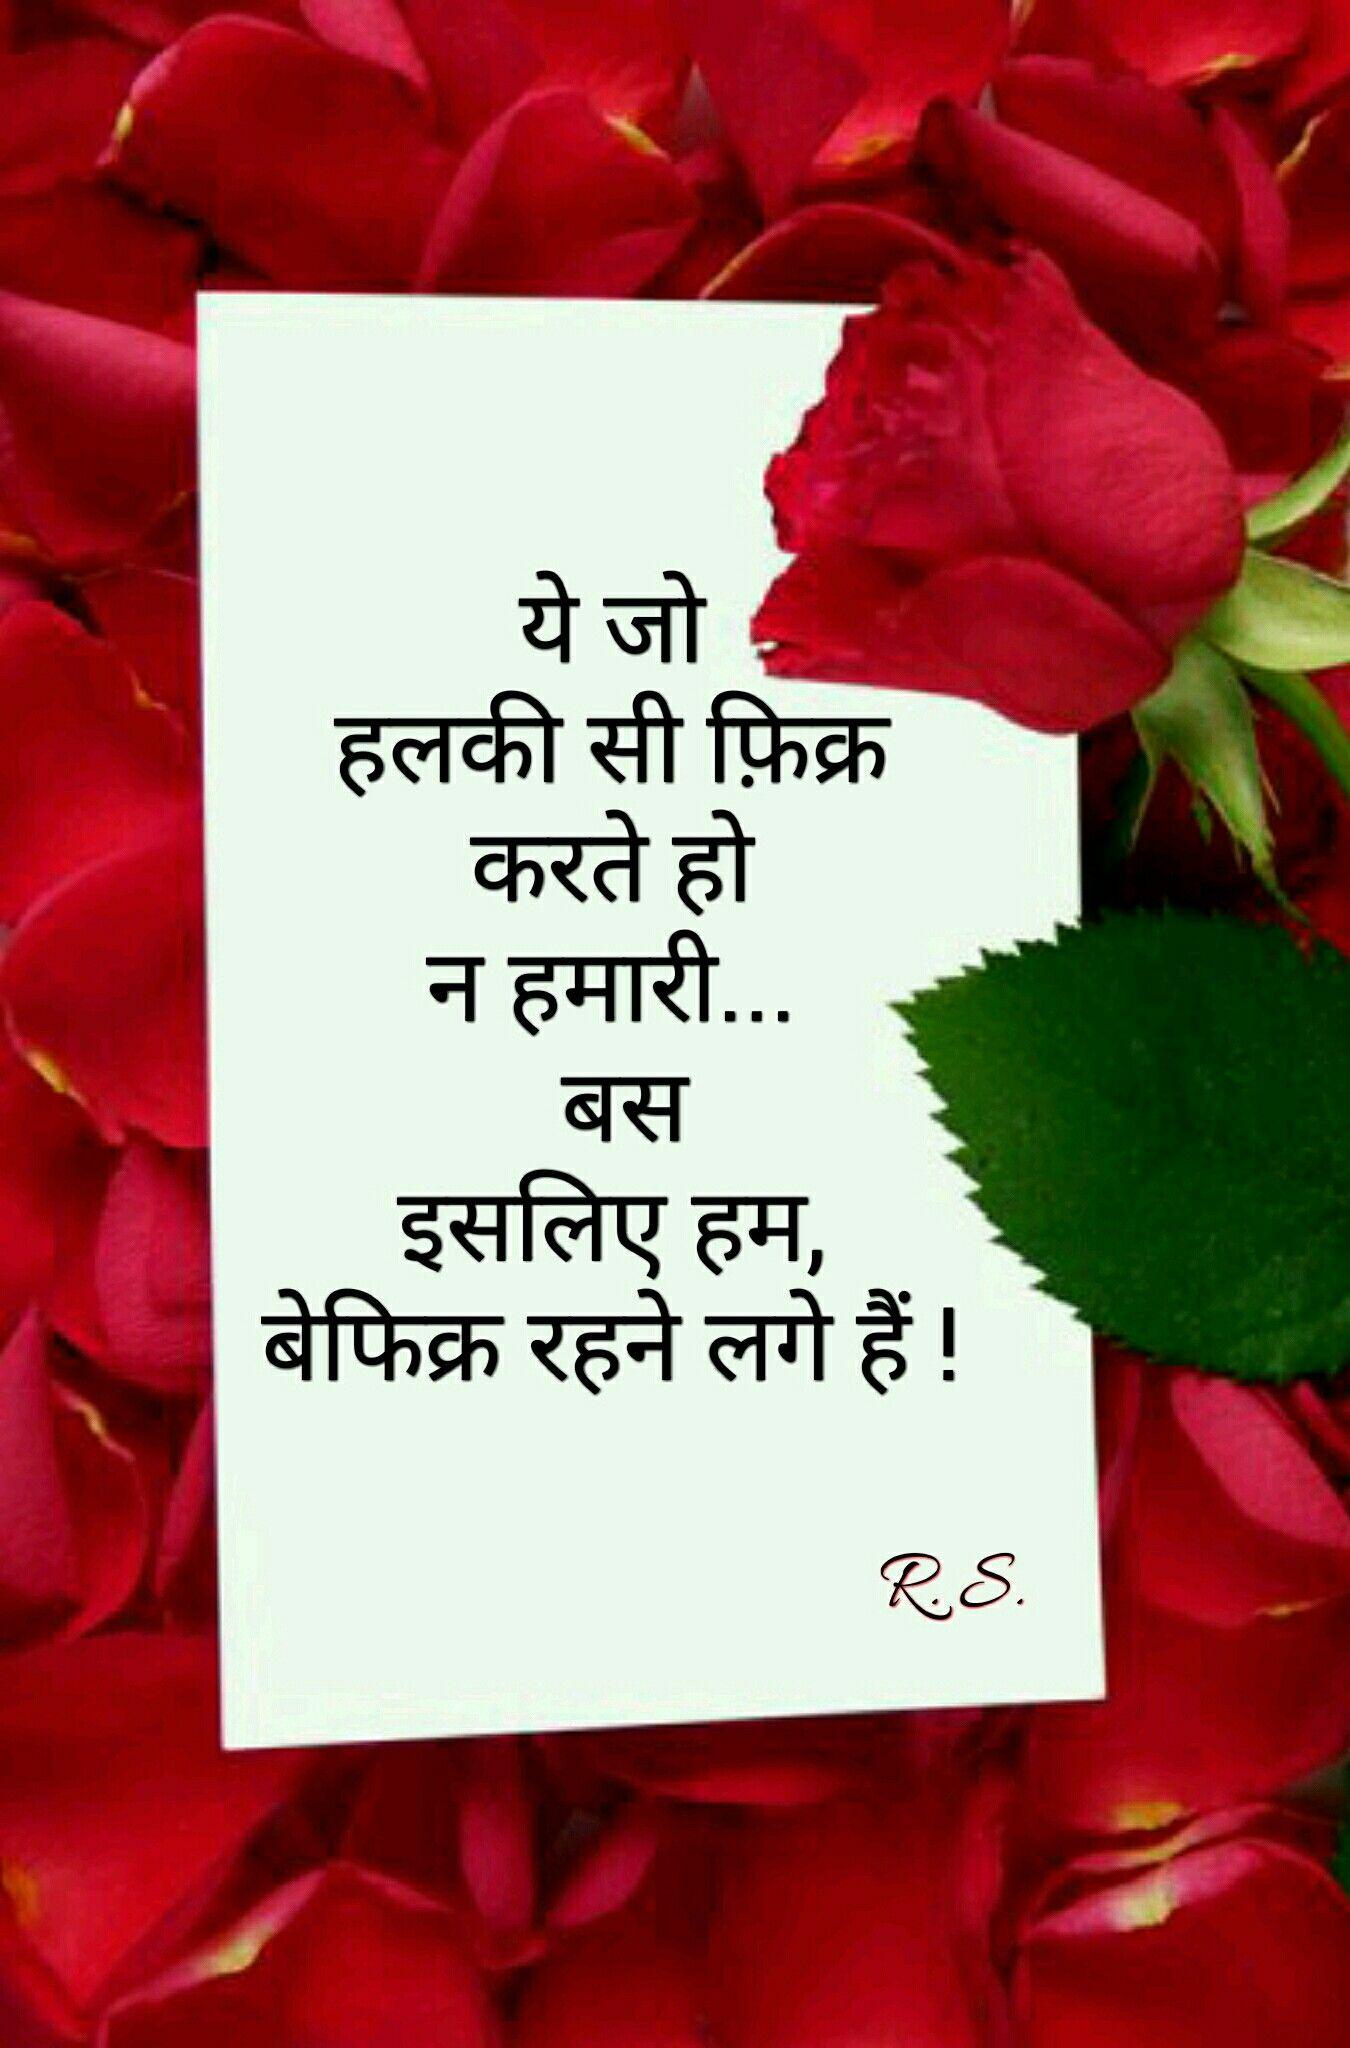 wedding anniversary wishes shayari in hindi%0A Hindi Quotes  Eyeshadow Tutorials  Dil Se  Friendship Quotes  Thoughts   Graffiti  Motivational  Feelings  Sunset